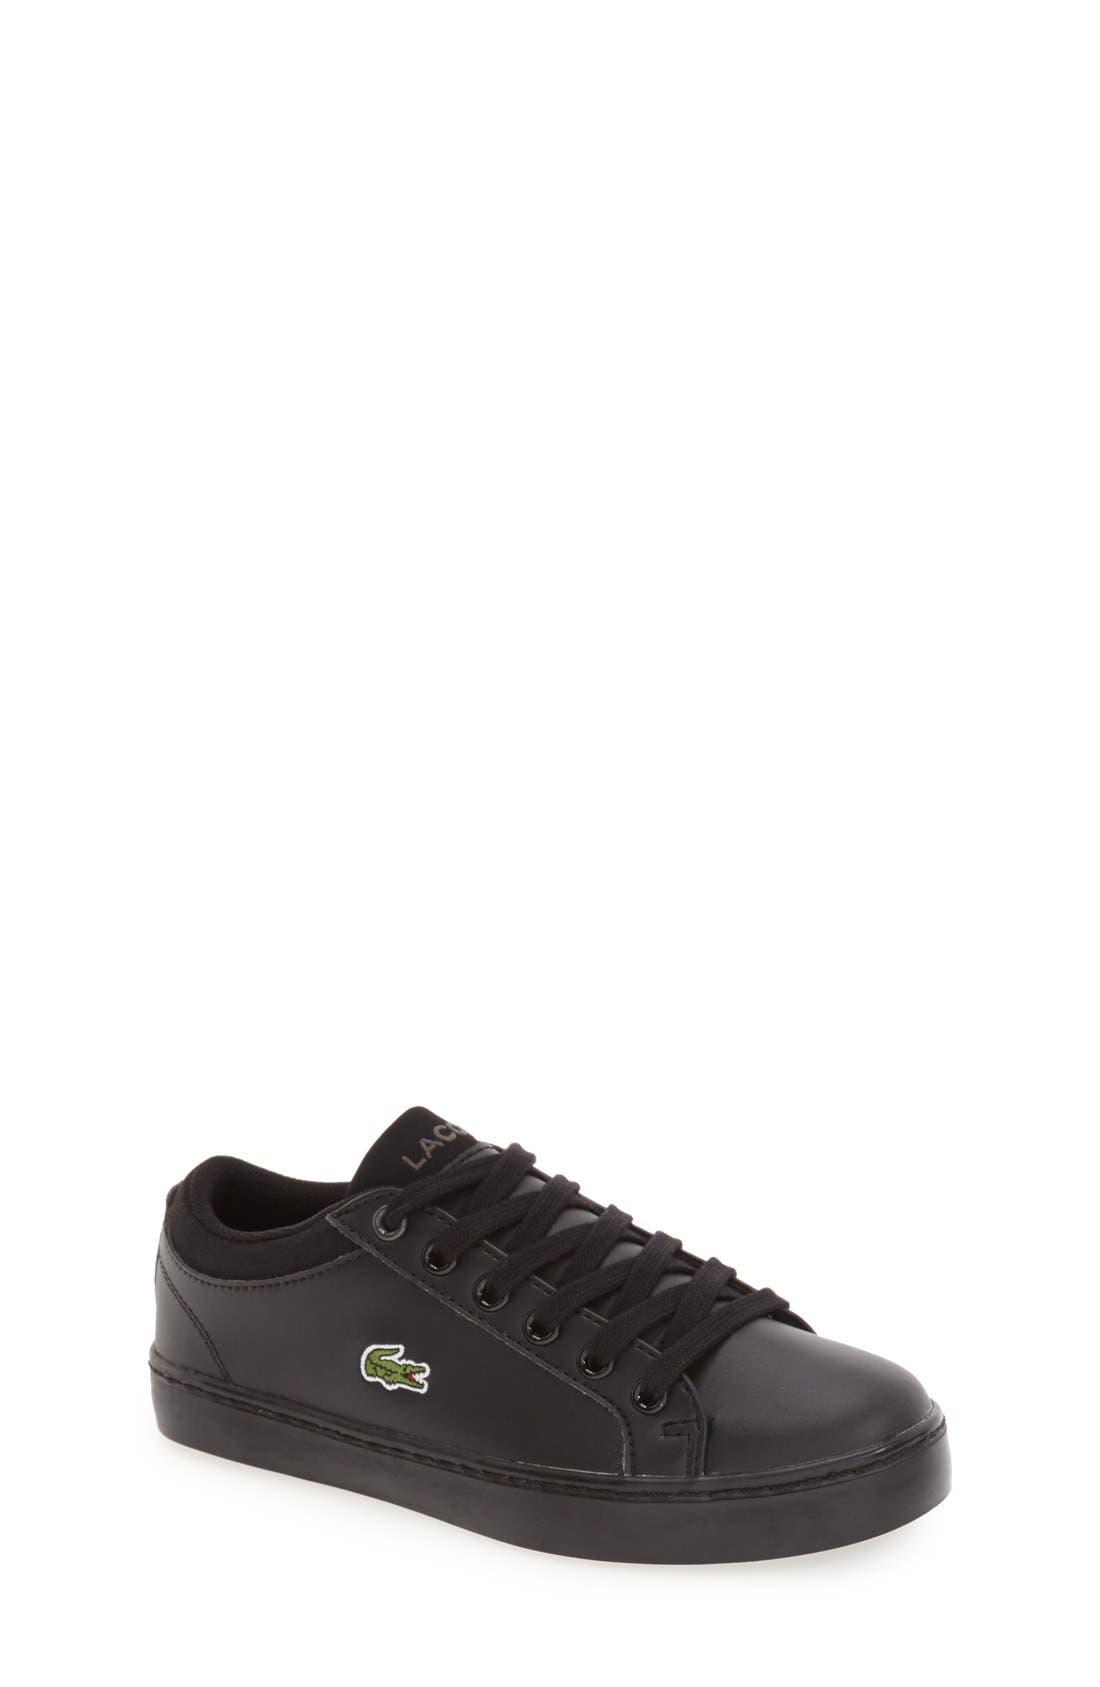 Main Image - Lacoste 'Straightset' Sneaker (Toddler, Little Kid & Big Kid)